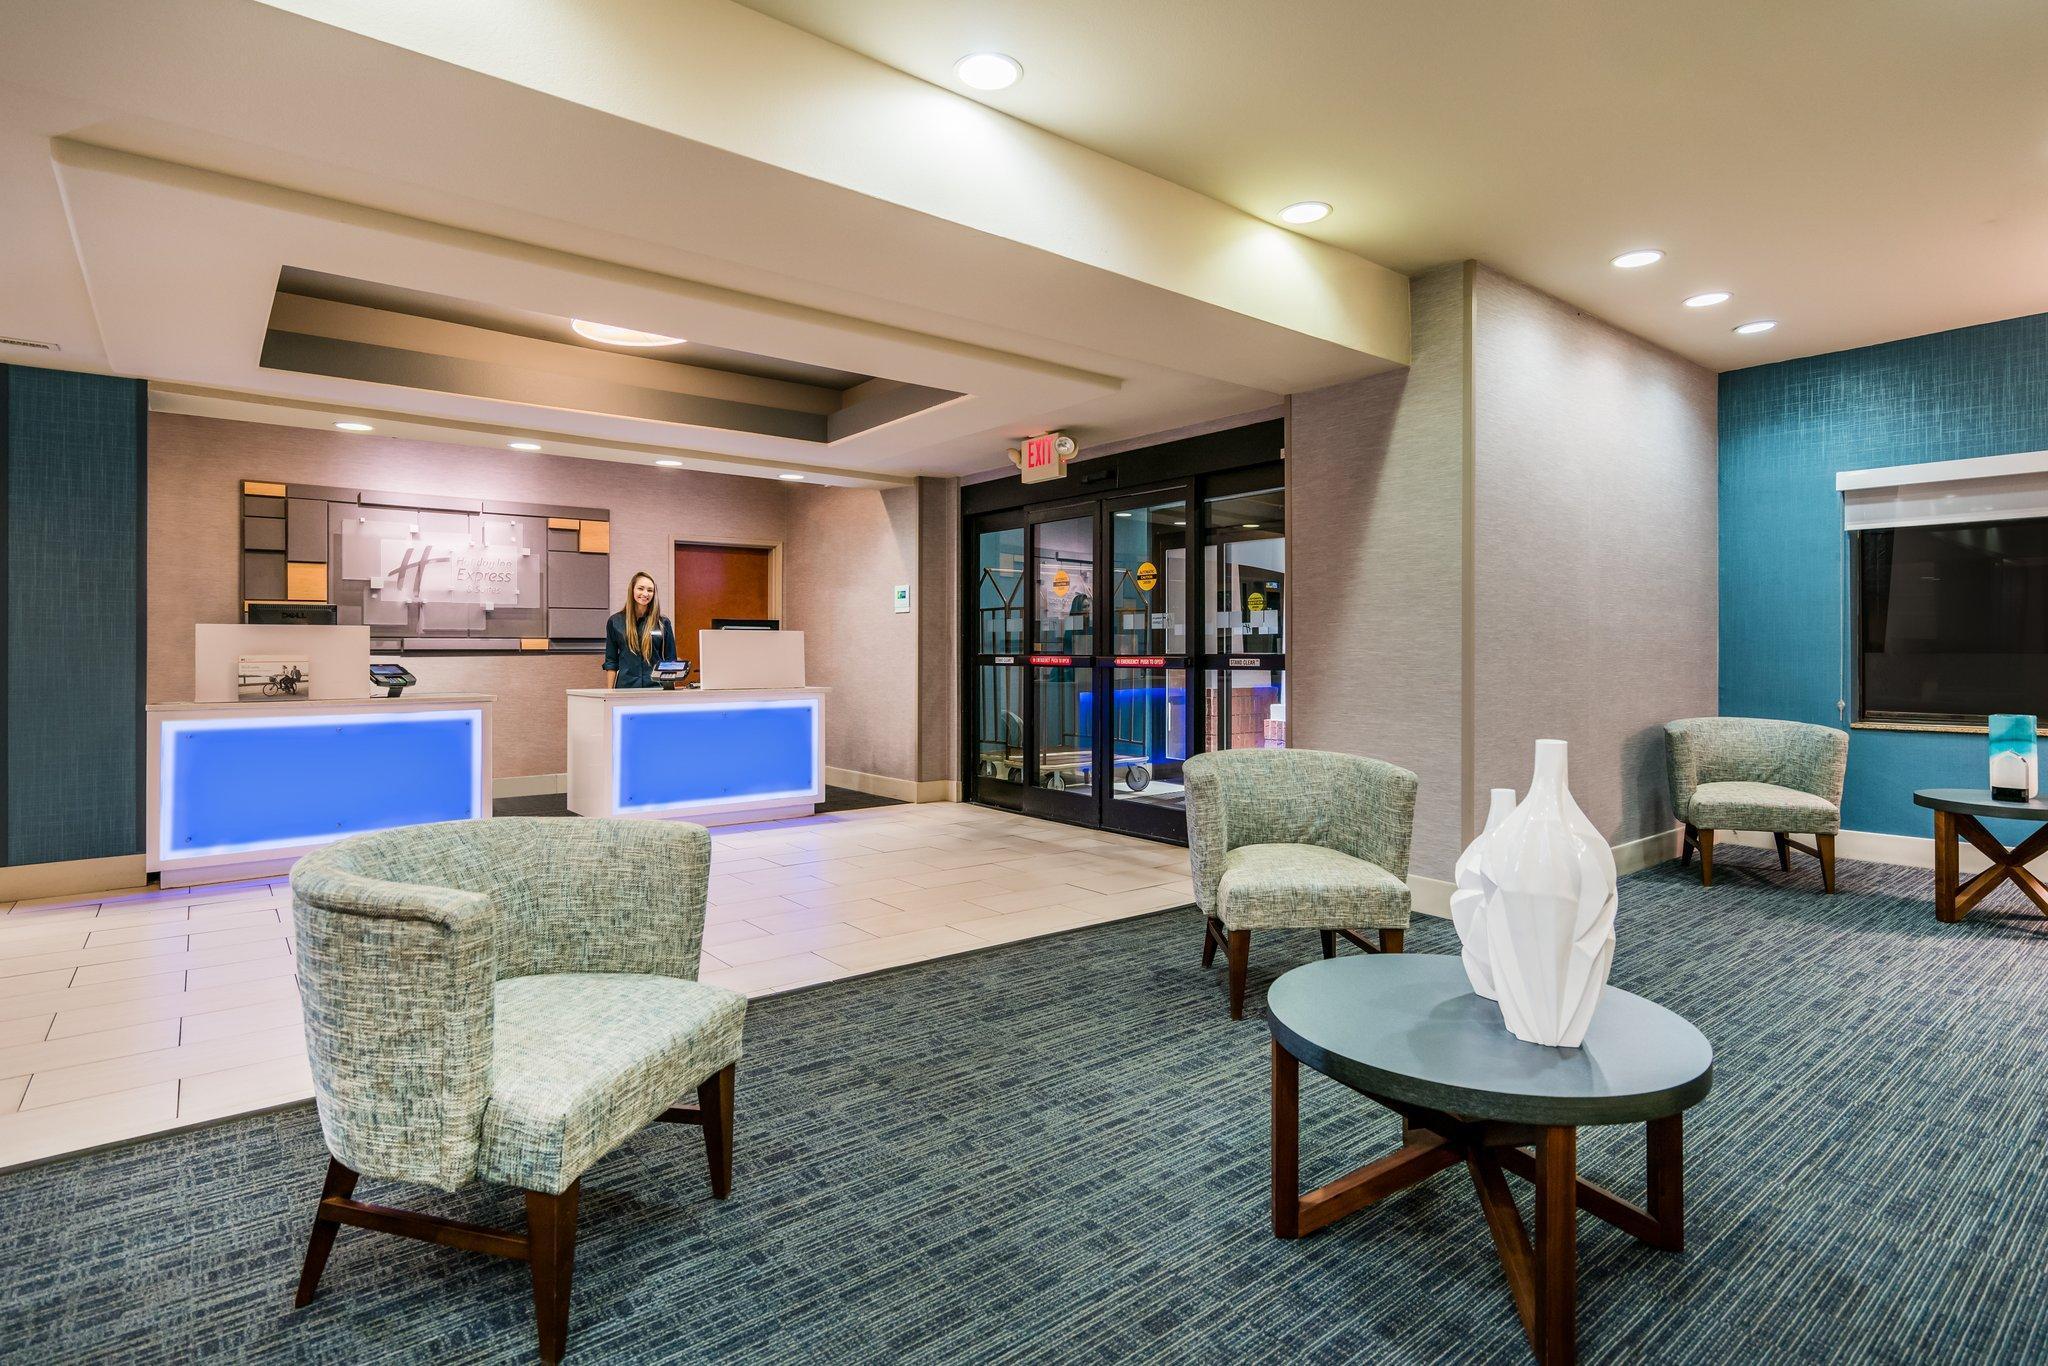 Holiday Inn Express & Suites Rocky Mount Smith Mountain Lake, Franklin